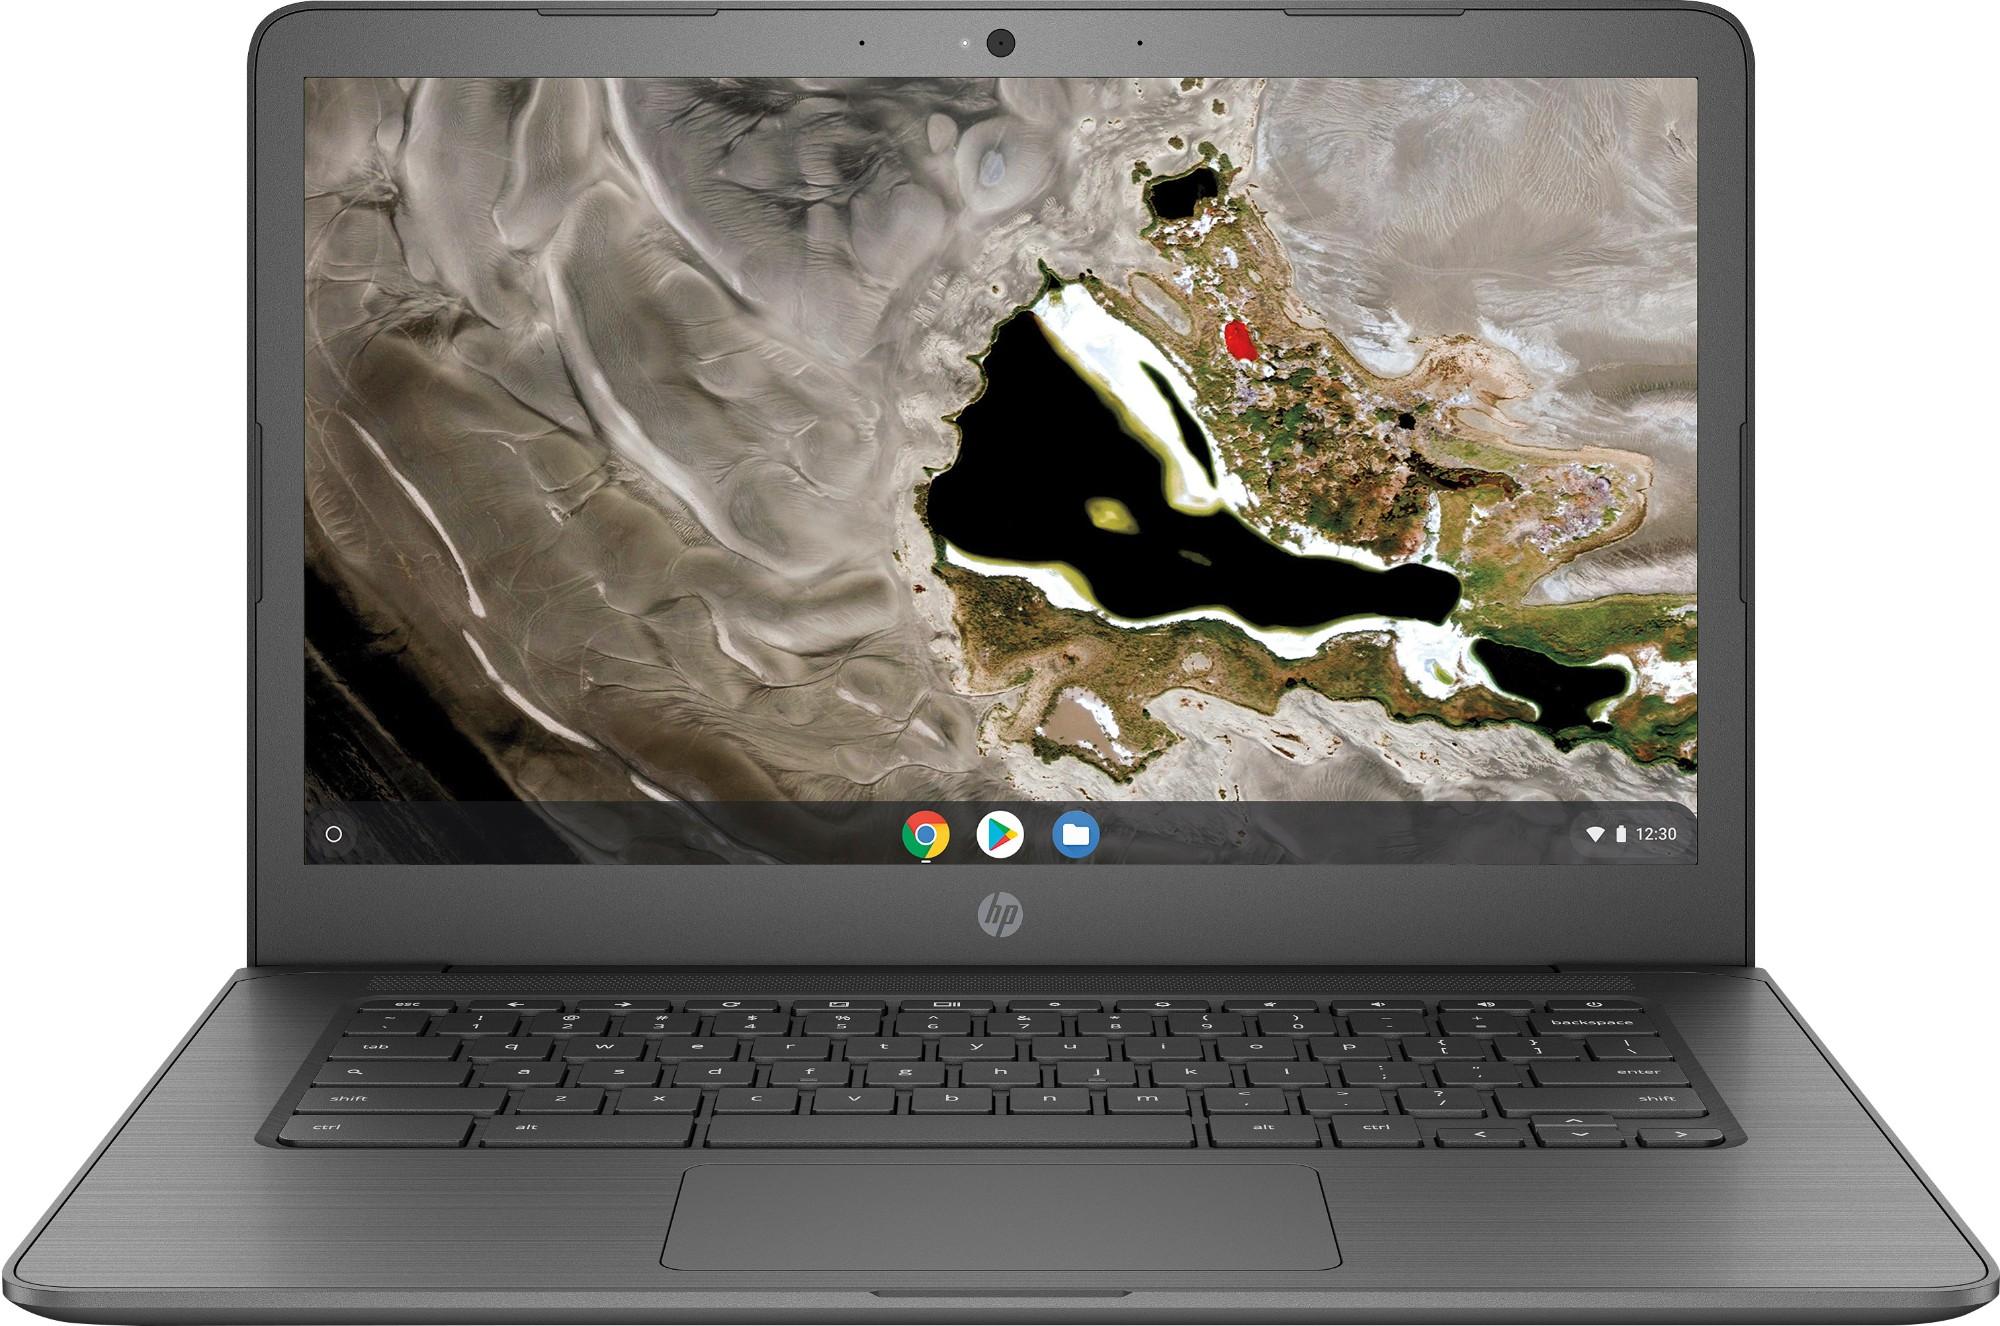 "HP Chromebook 14A G5 Grijs 35,6 cm (14"") 1920 x 1080 Pixels Touchscreen 7th Generation AMD A4-Series APUs A4-9120C 4 GB DDR4-SDRAM 32 GB eMMC"